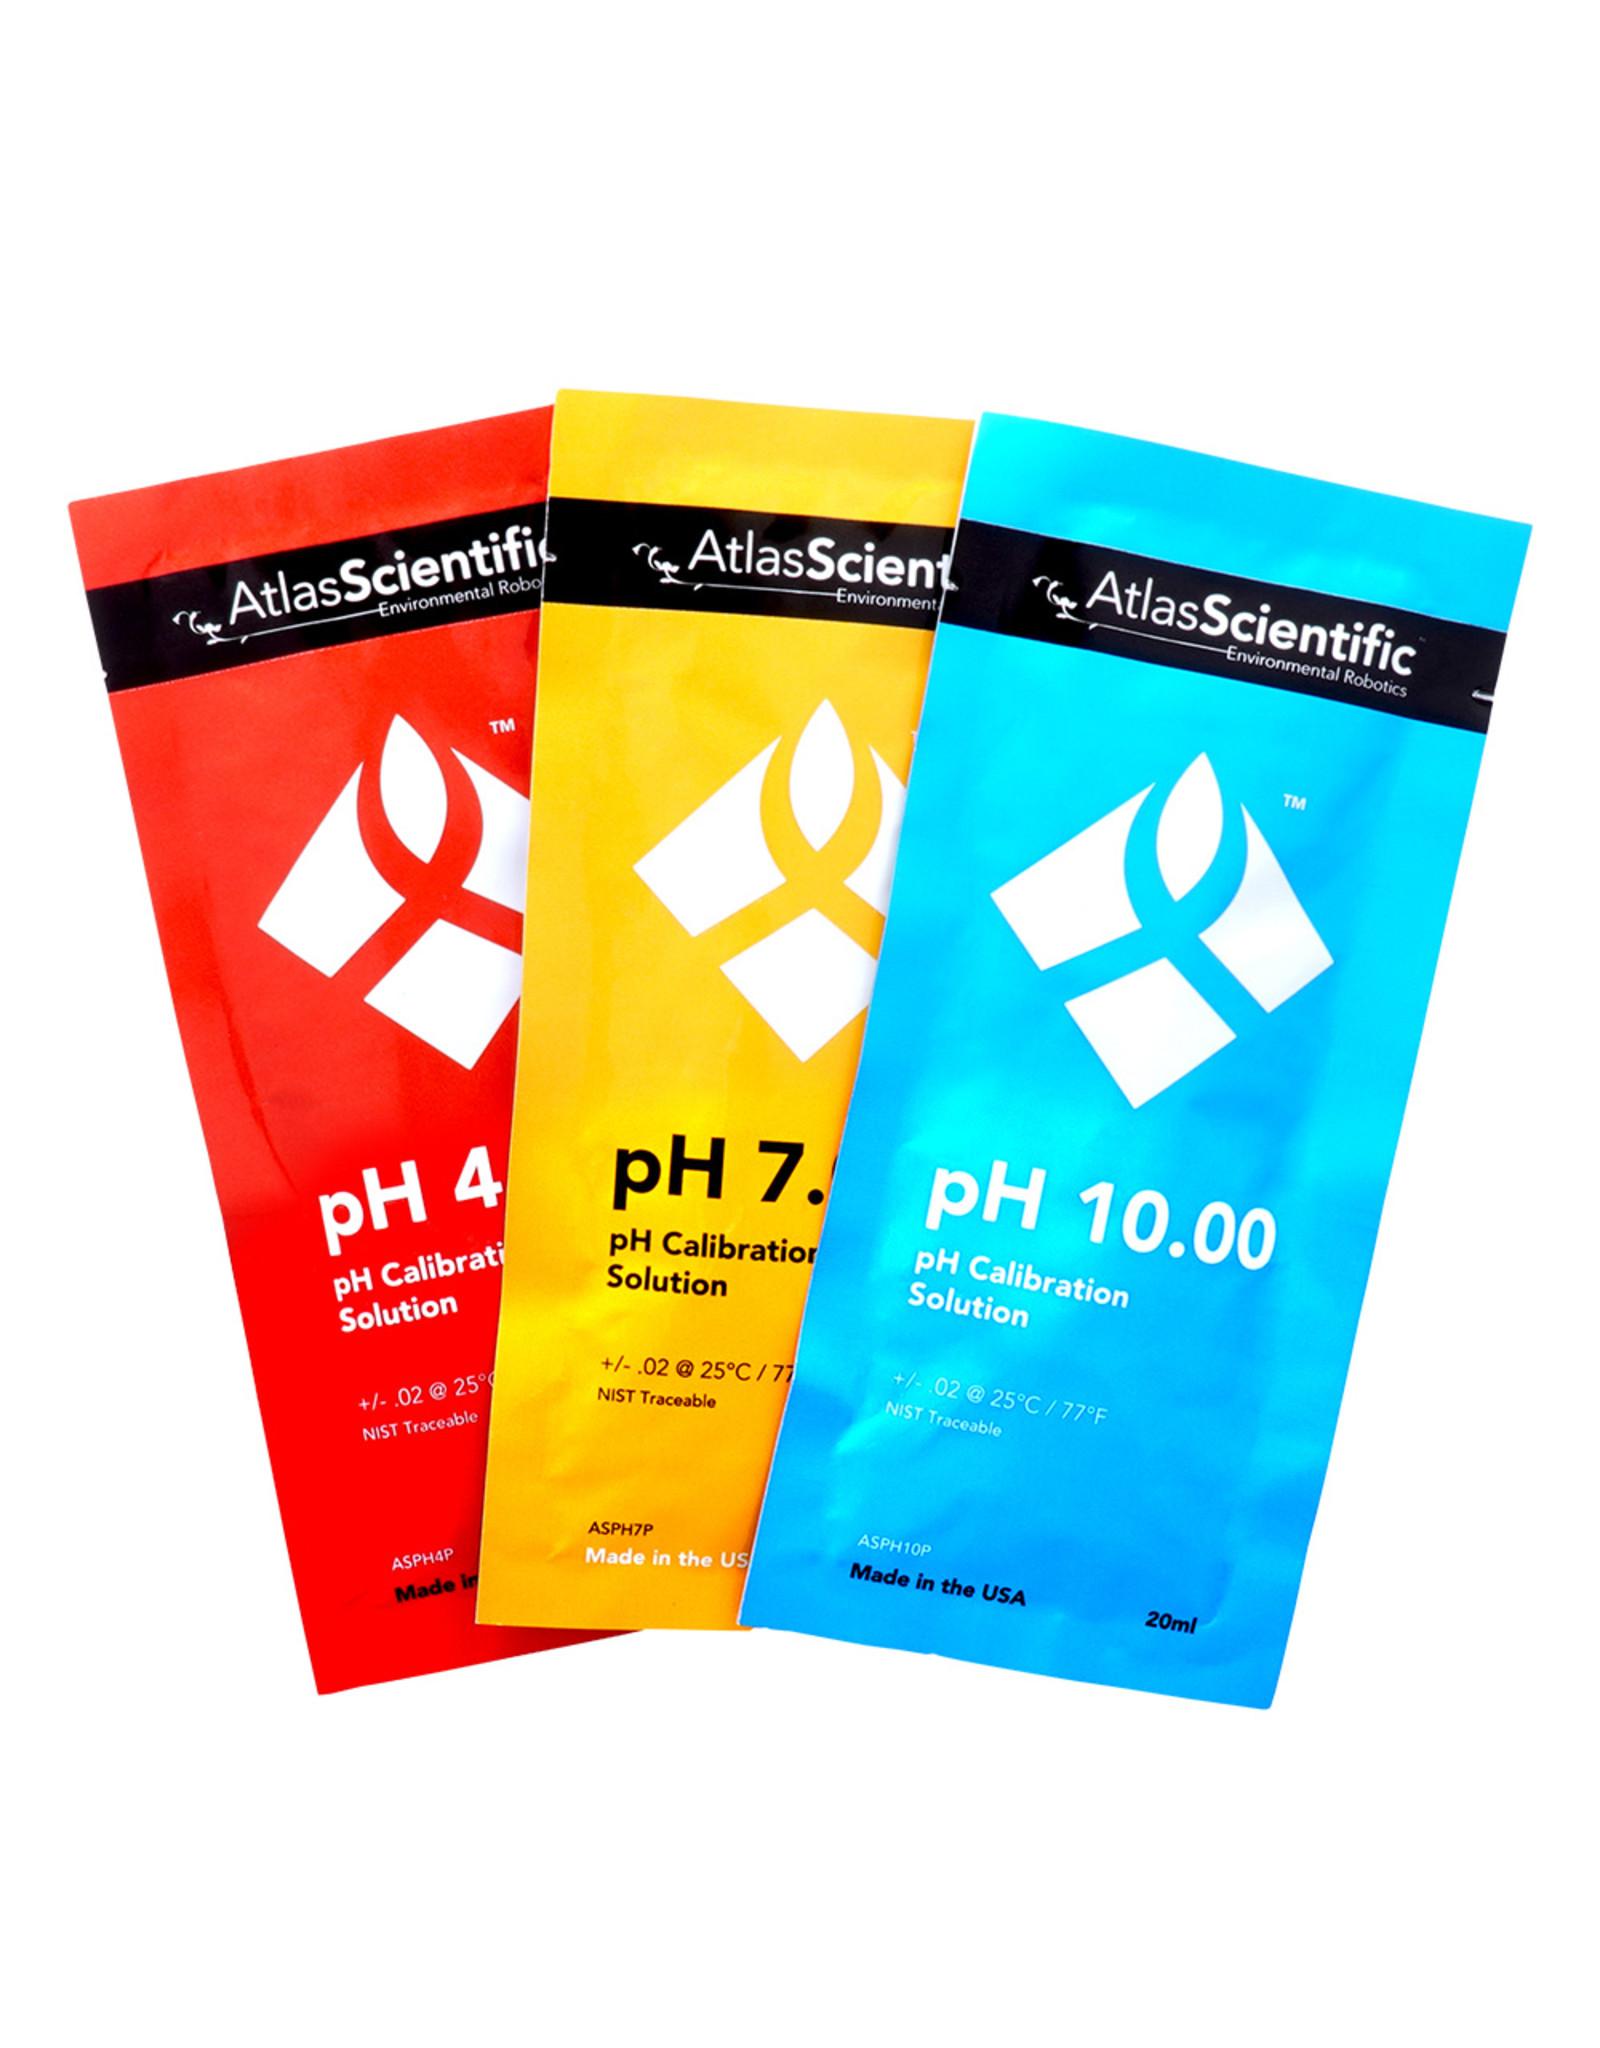 Atlas Scientific pH 10.00 Calibration Solution Pouche